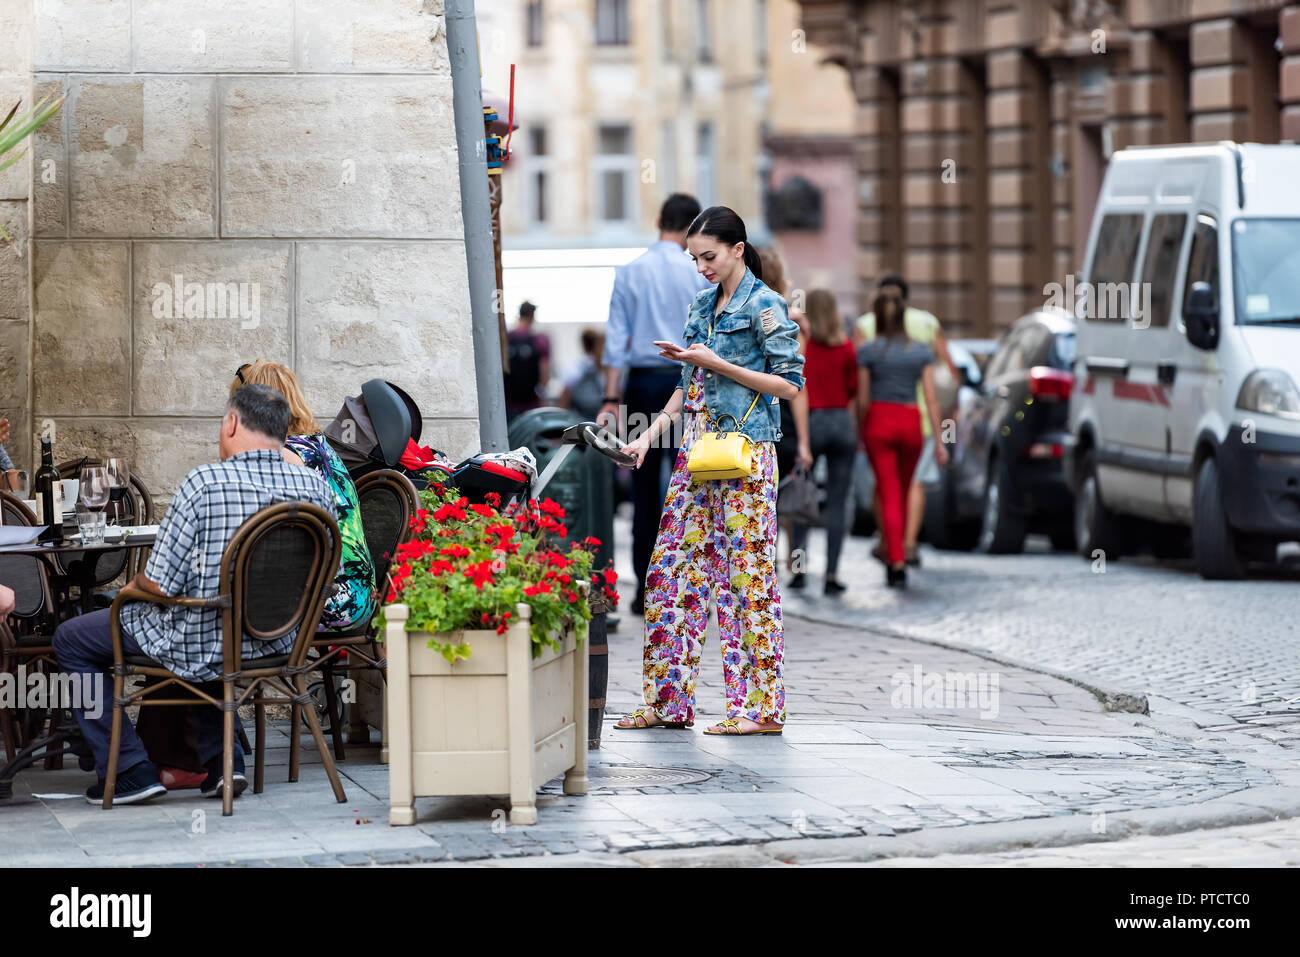 Lviv, Ukraine - July 30, 2018: Slavic Eastern European Ukrainian woman standing in historic Ukrainian Polish city in old town cobblestone street, baby - Stock Image